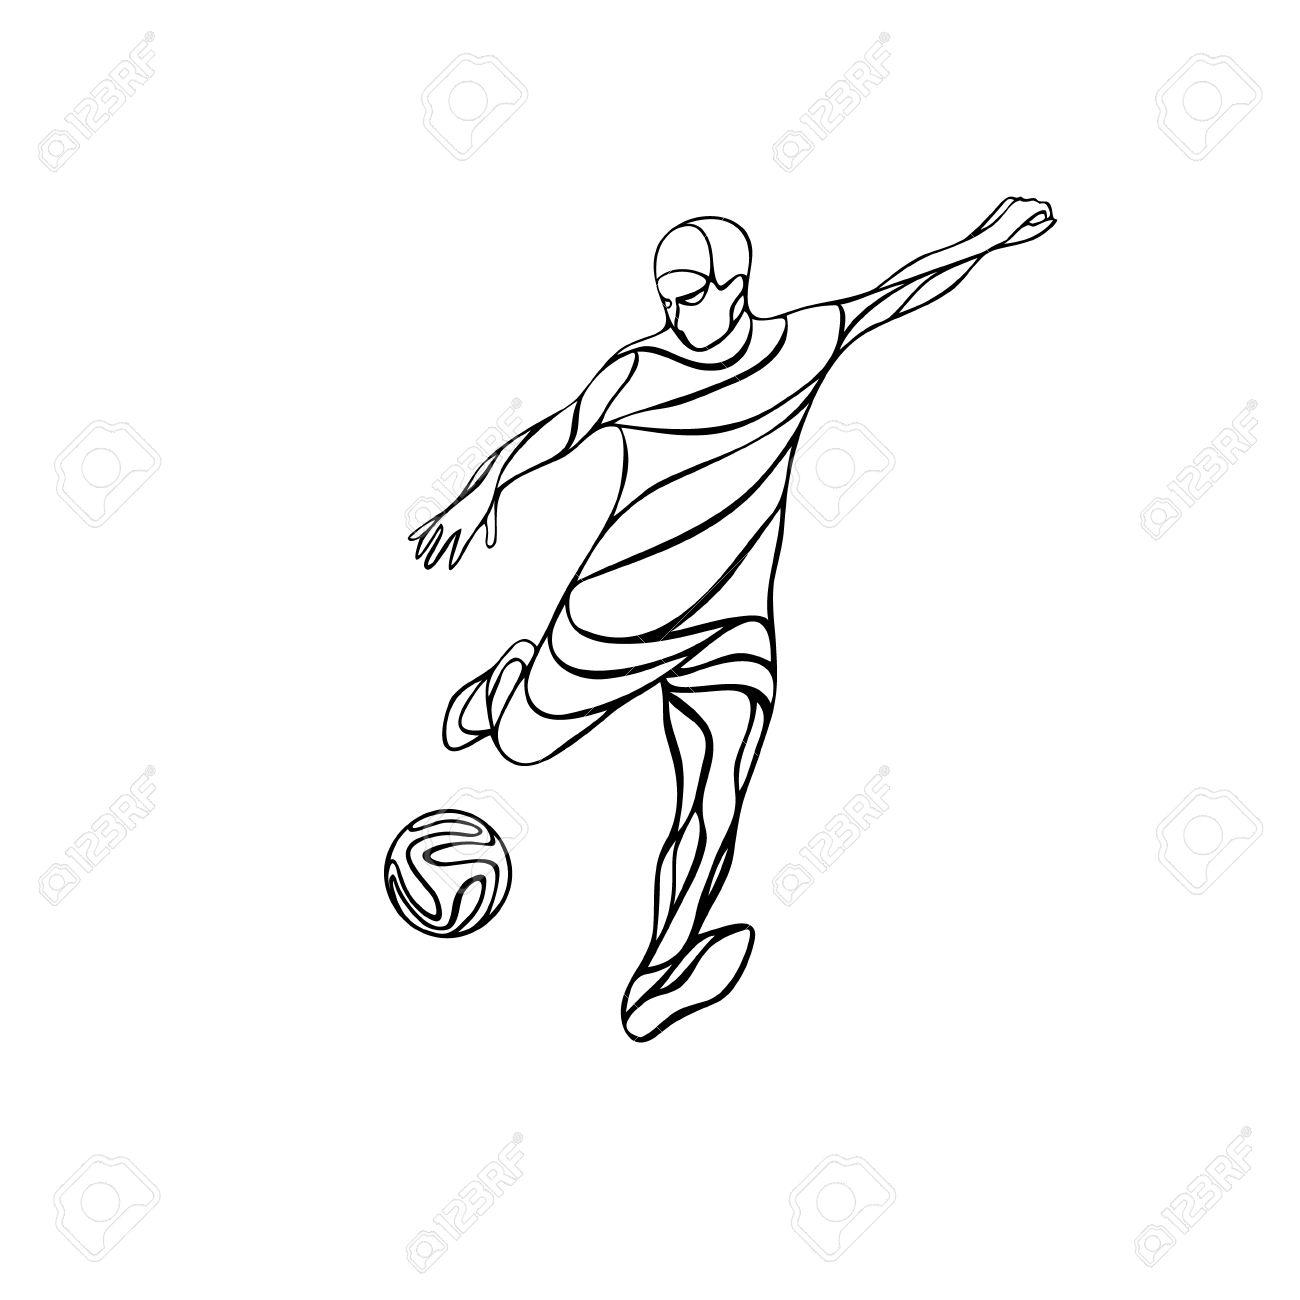 Soccer Or Football Player Kicks The Ball Abstract Line Drawing